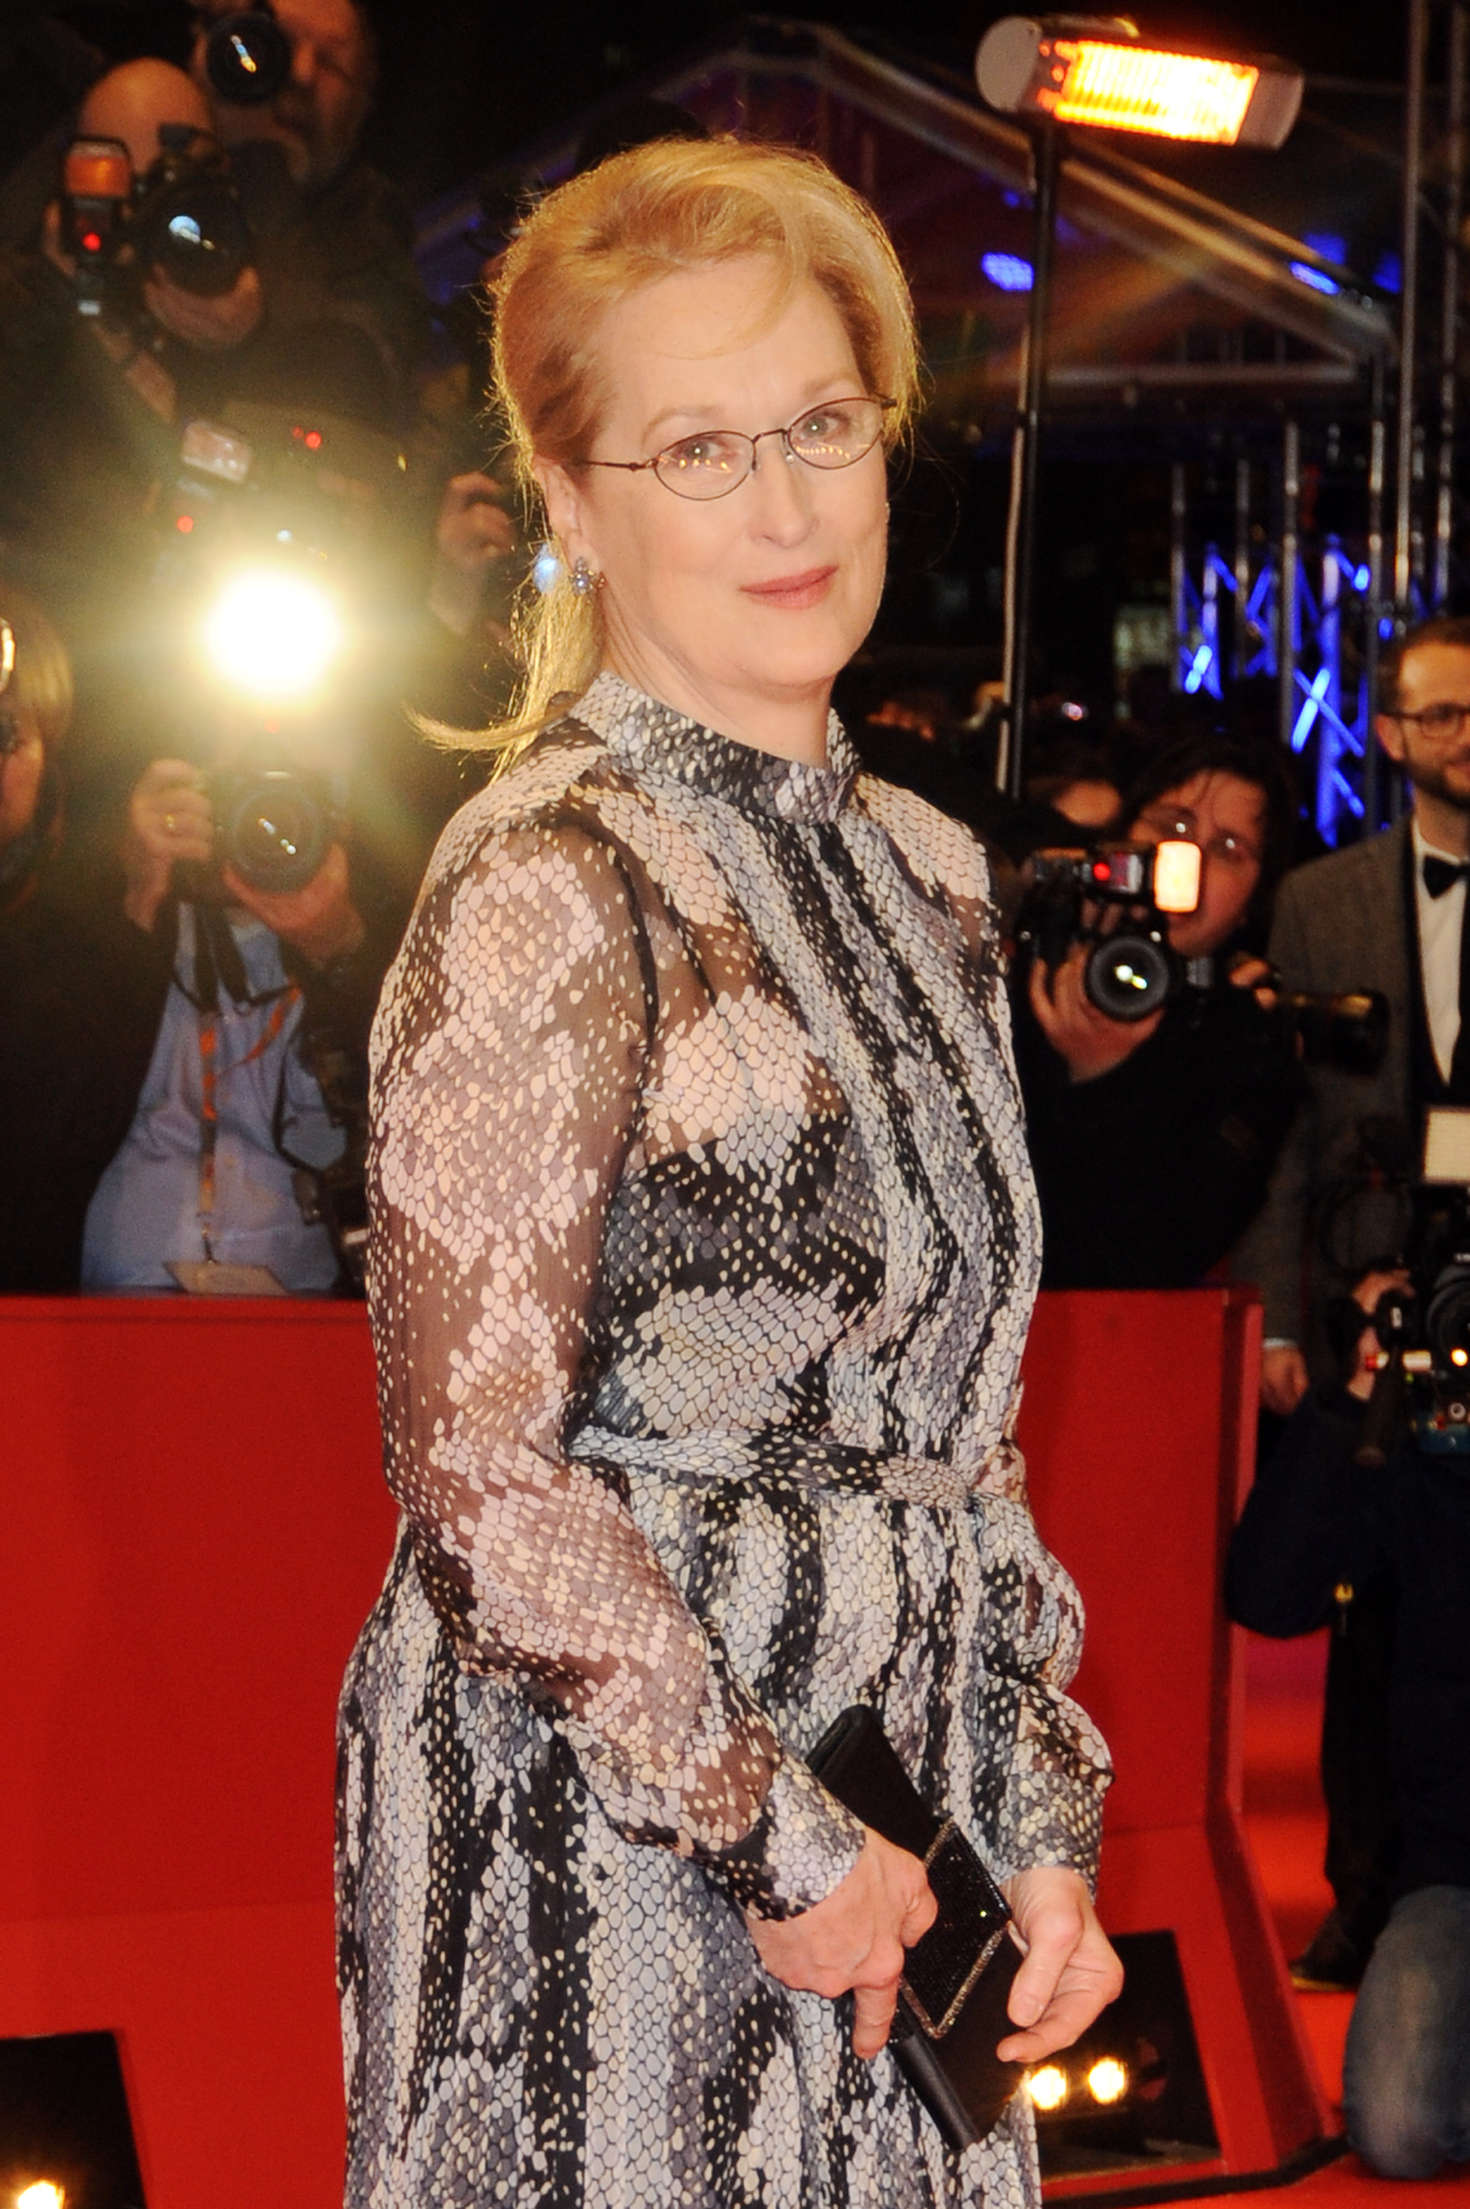 Meryl Streep Hail Caesar Premiere at the Berlin Film Festival